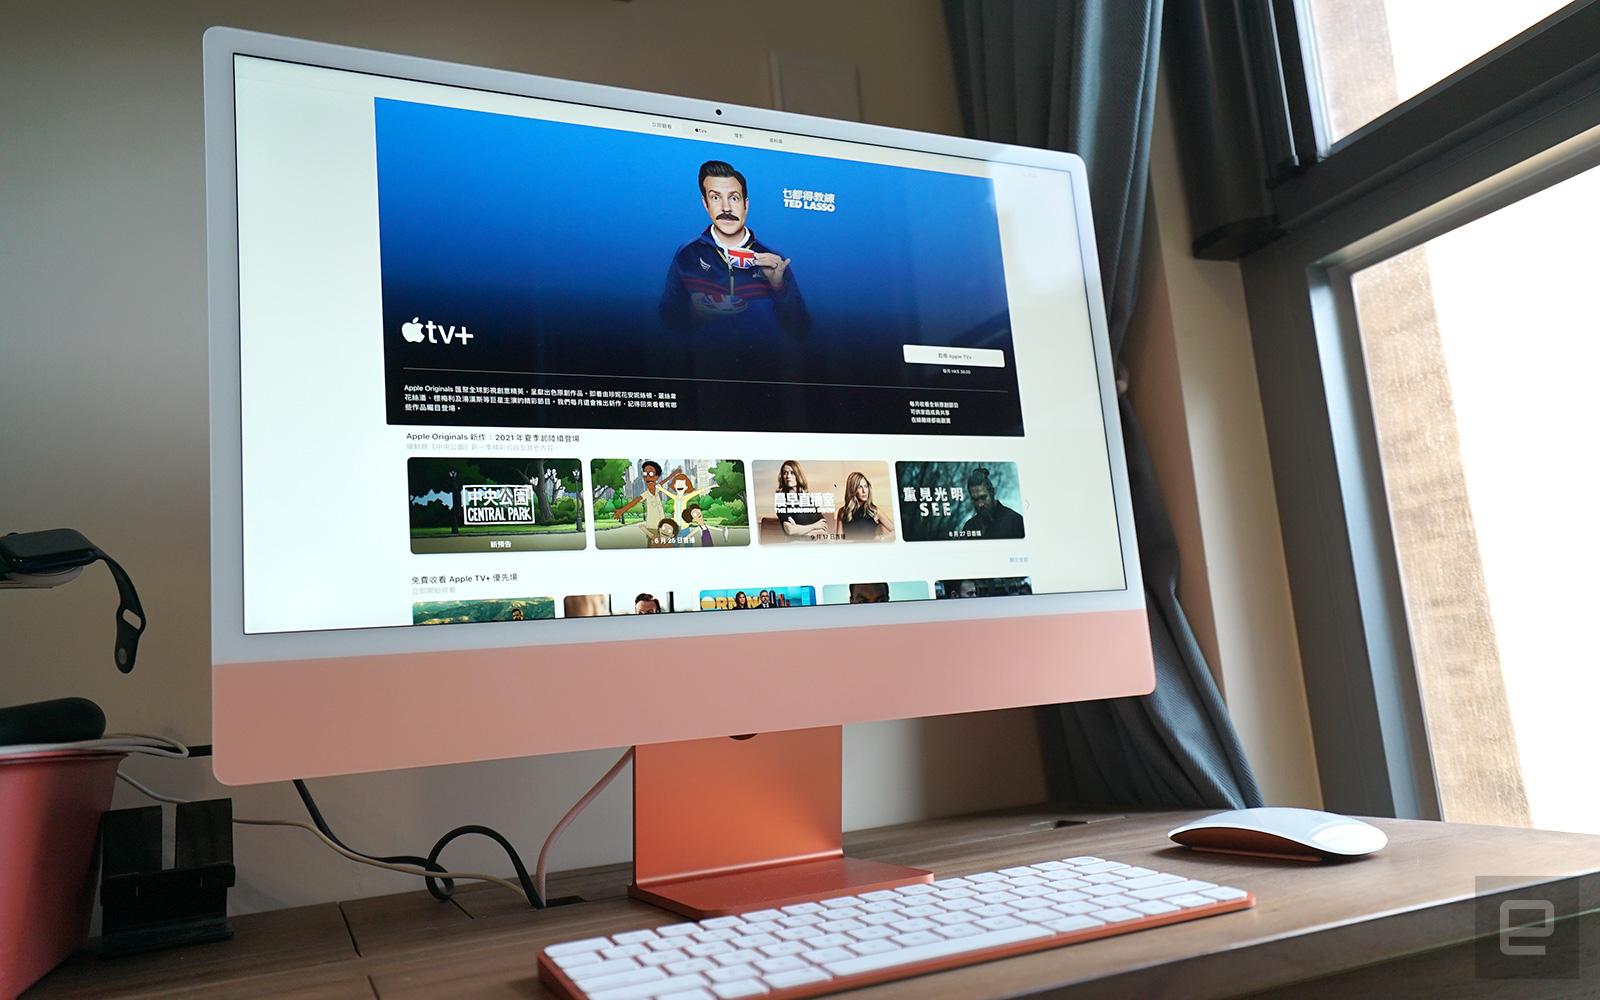 iMac 24 吋 M1 (2021) 評測